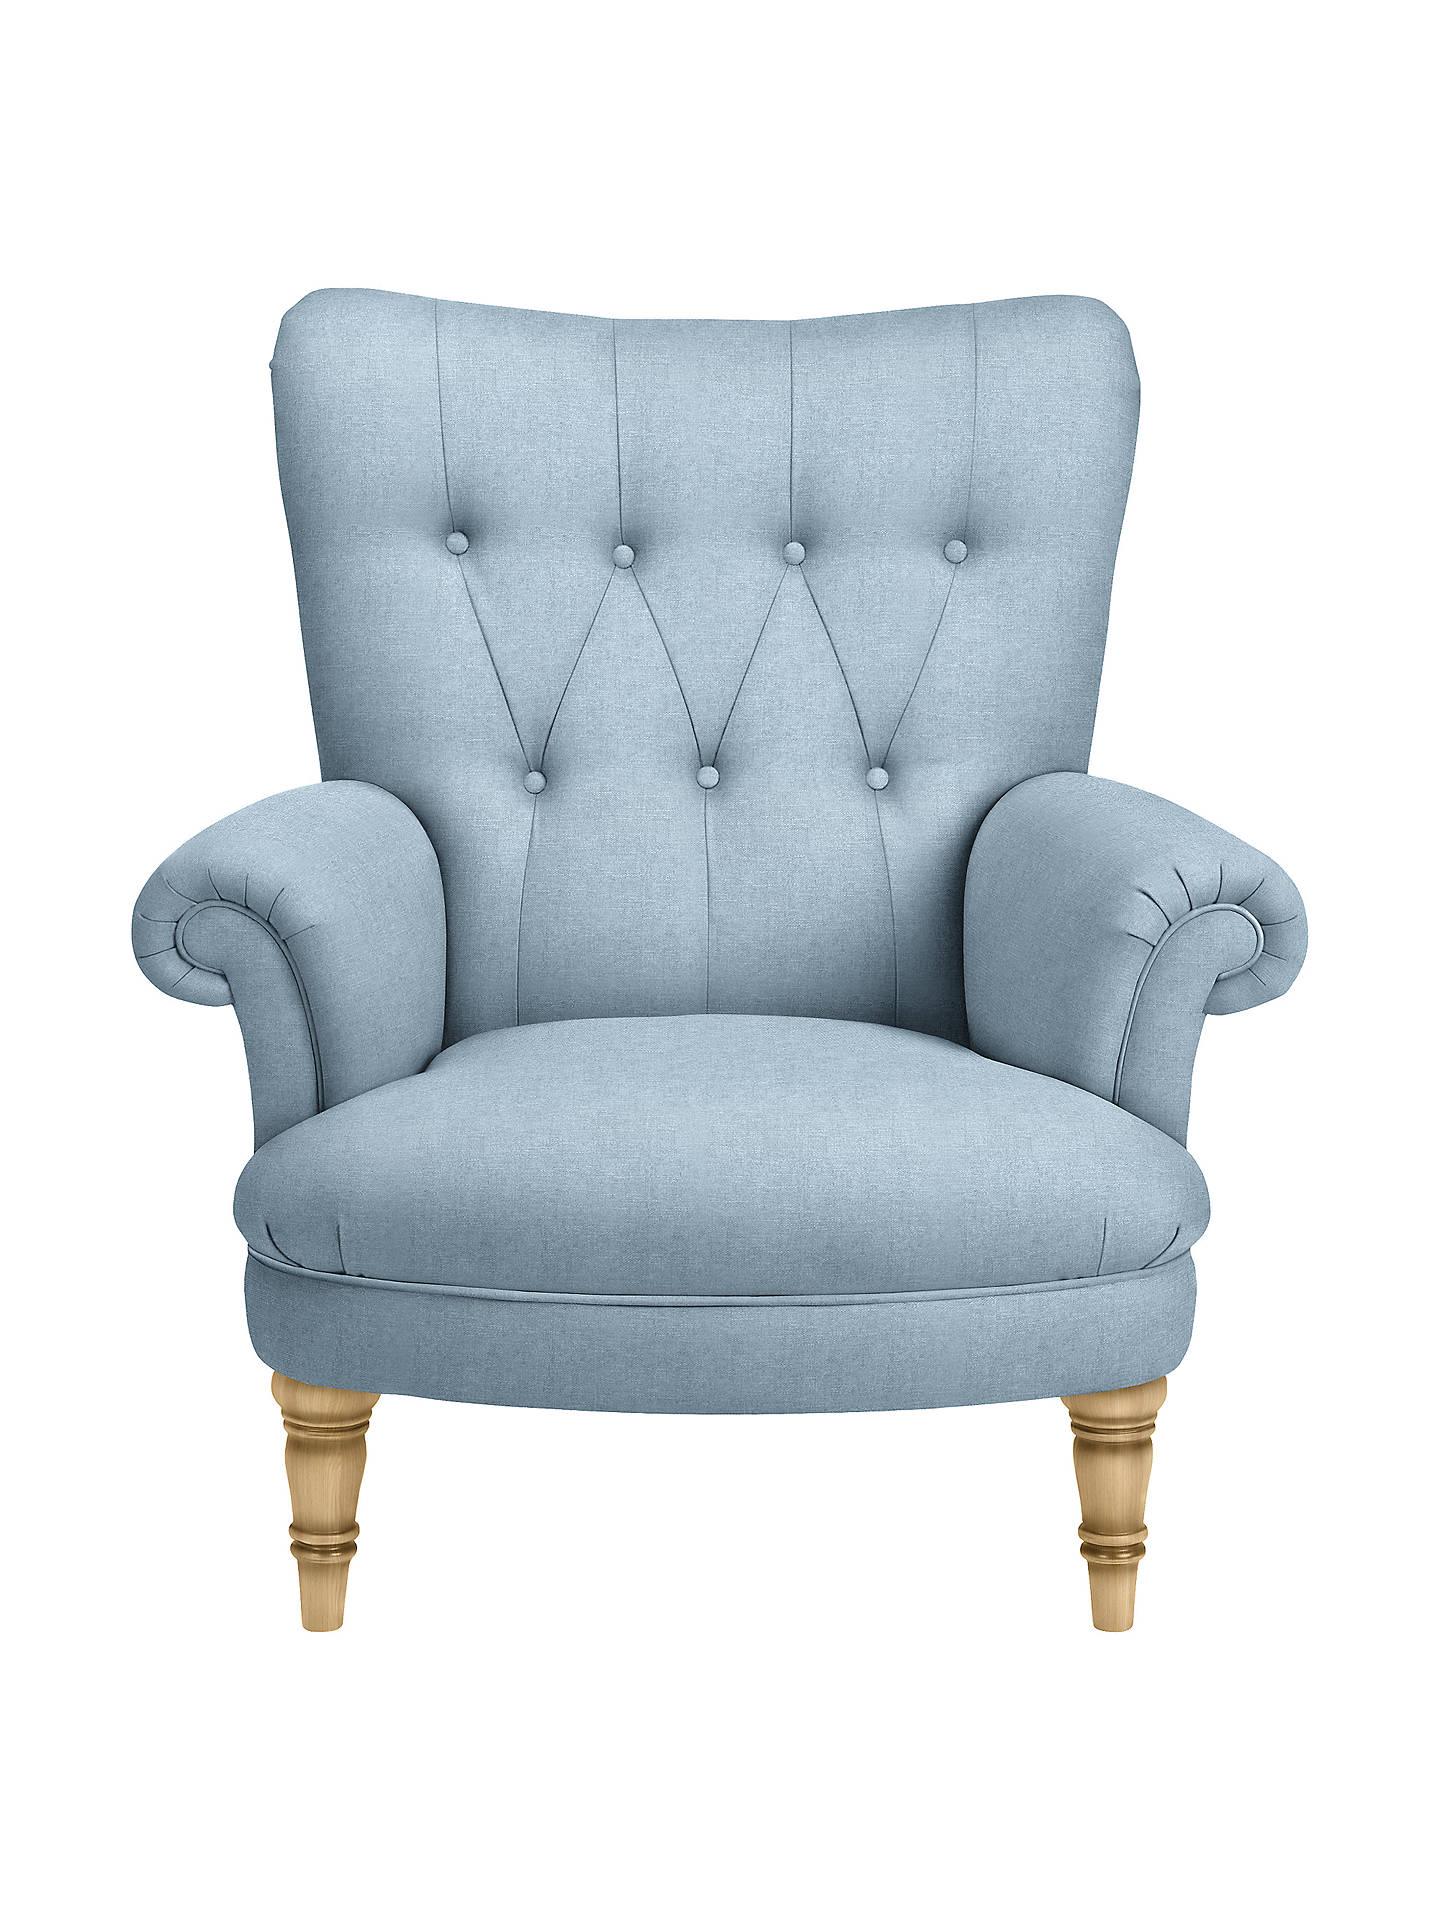 John Lewis & Partners Hambleton Armchair, Light Leg, Erin Duck Egg